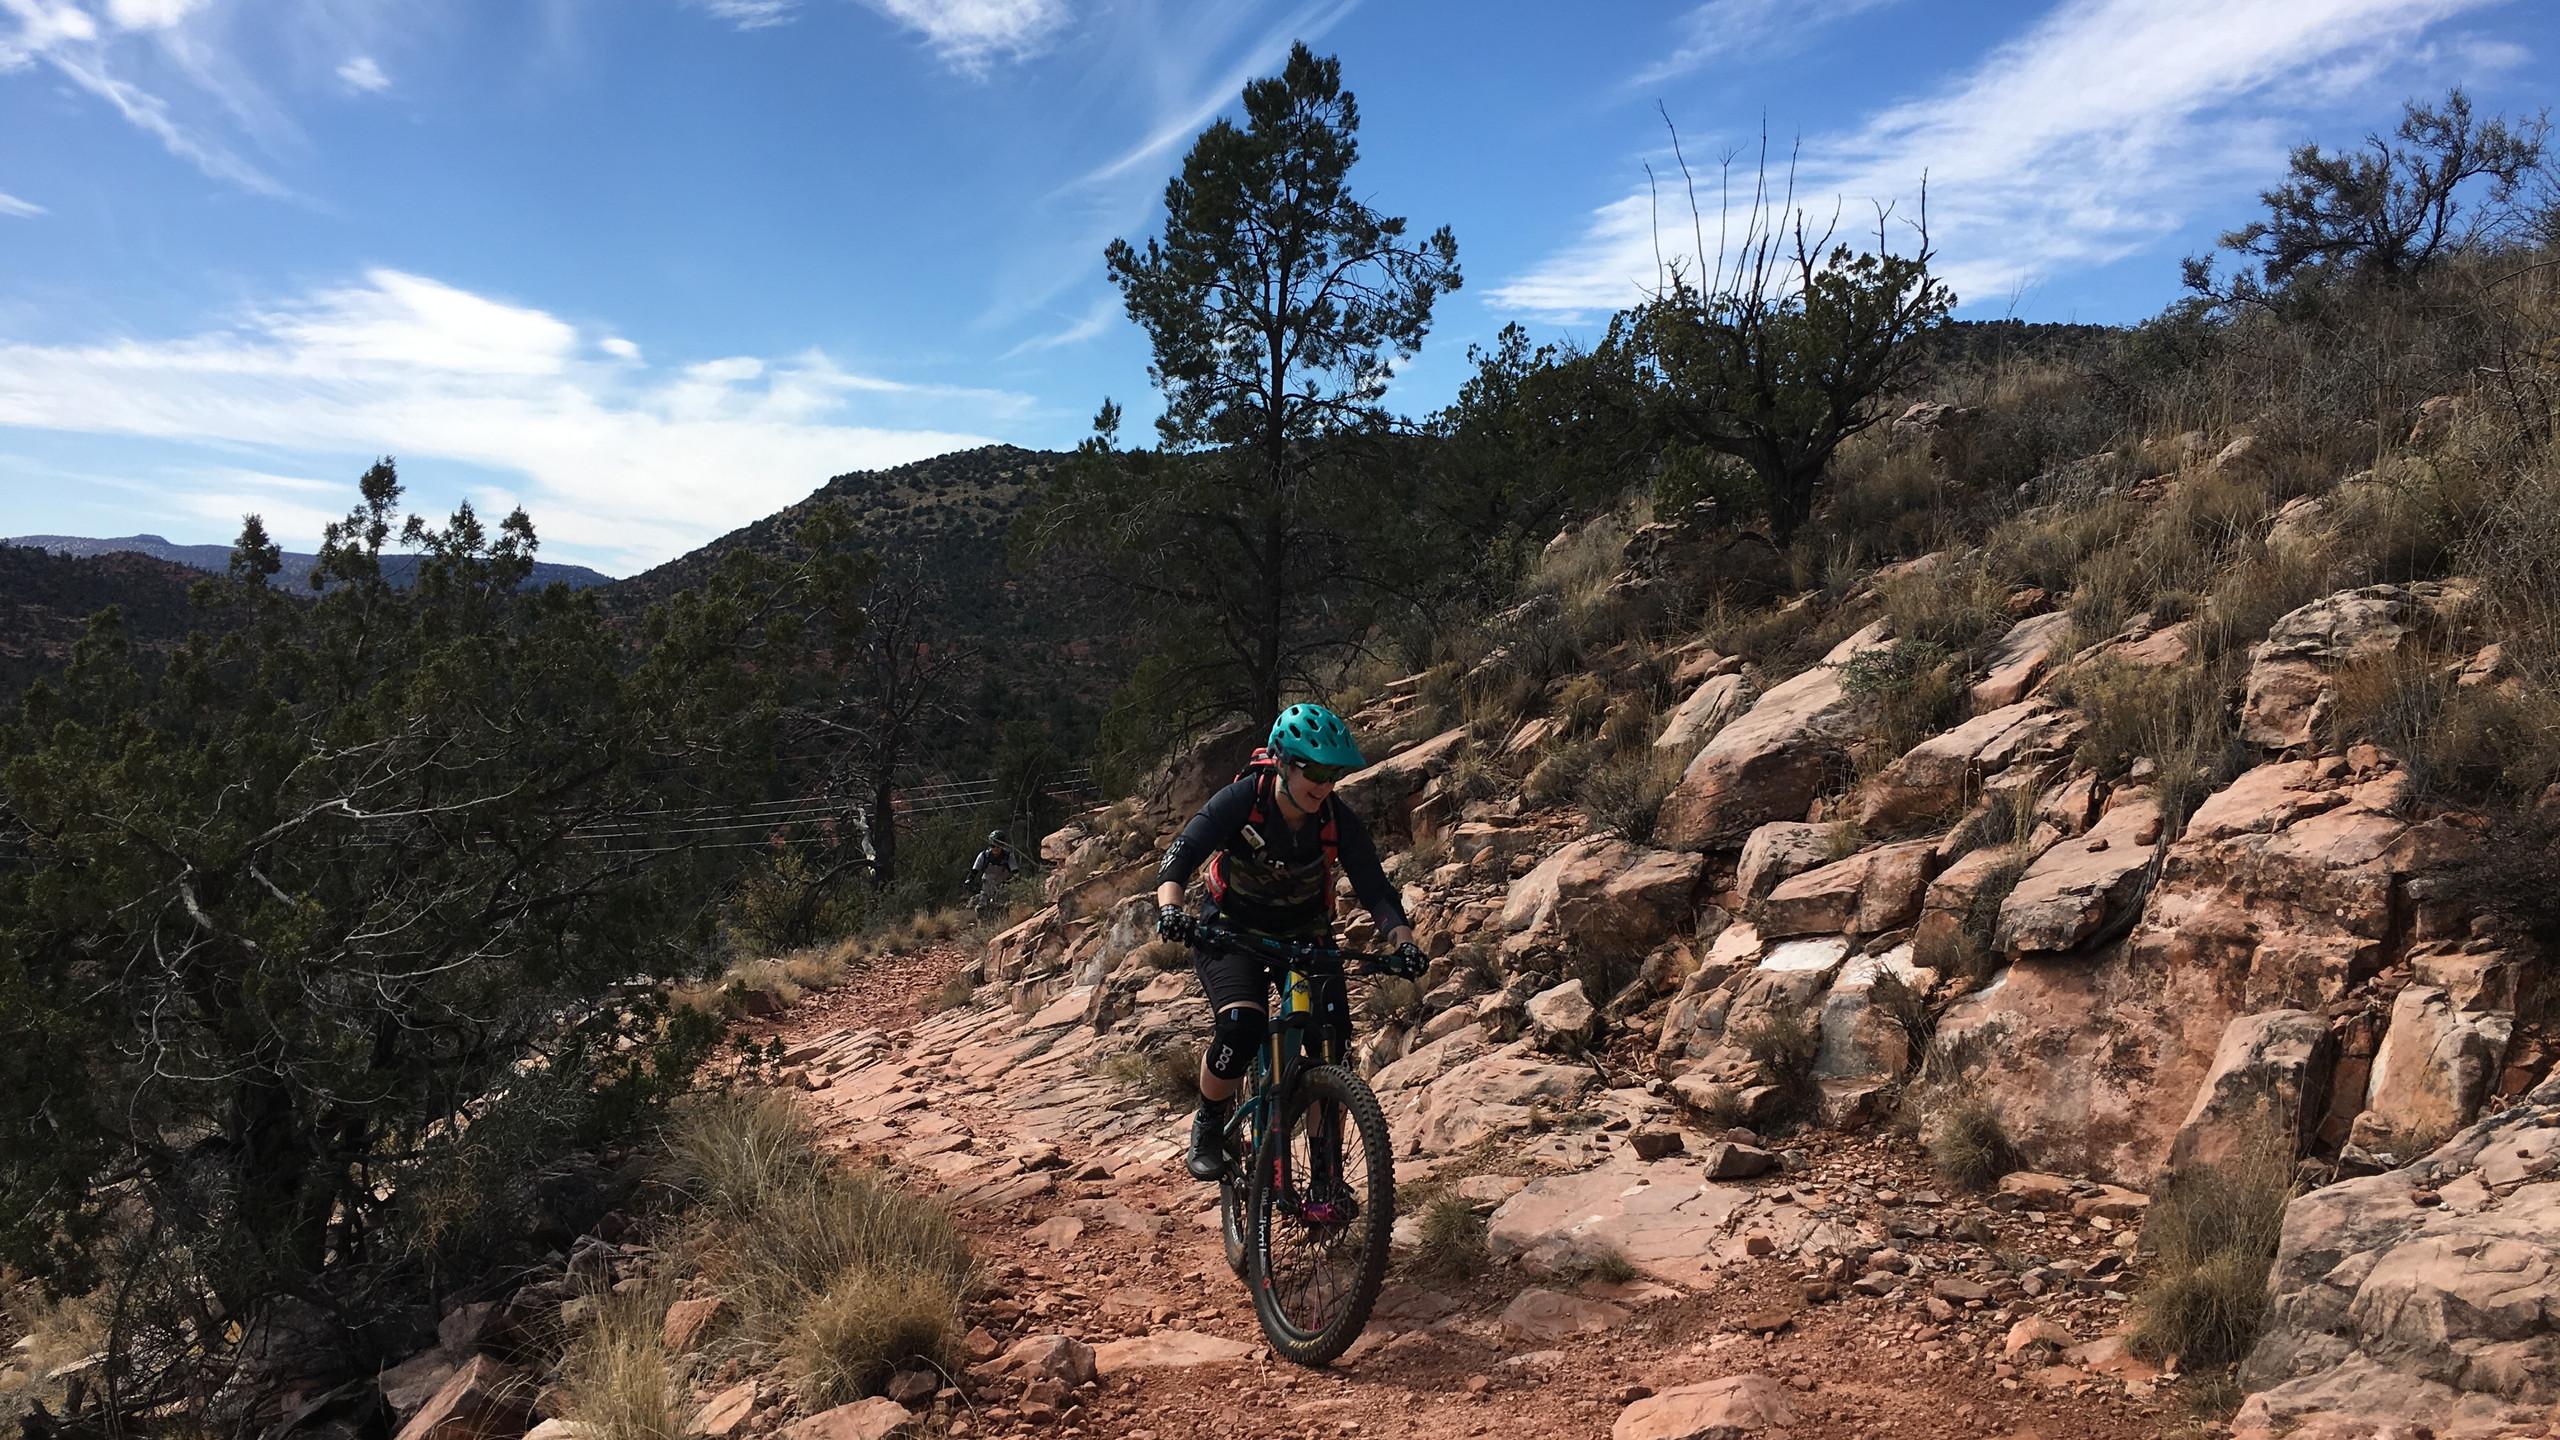 Climbing up Carroll Canyon